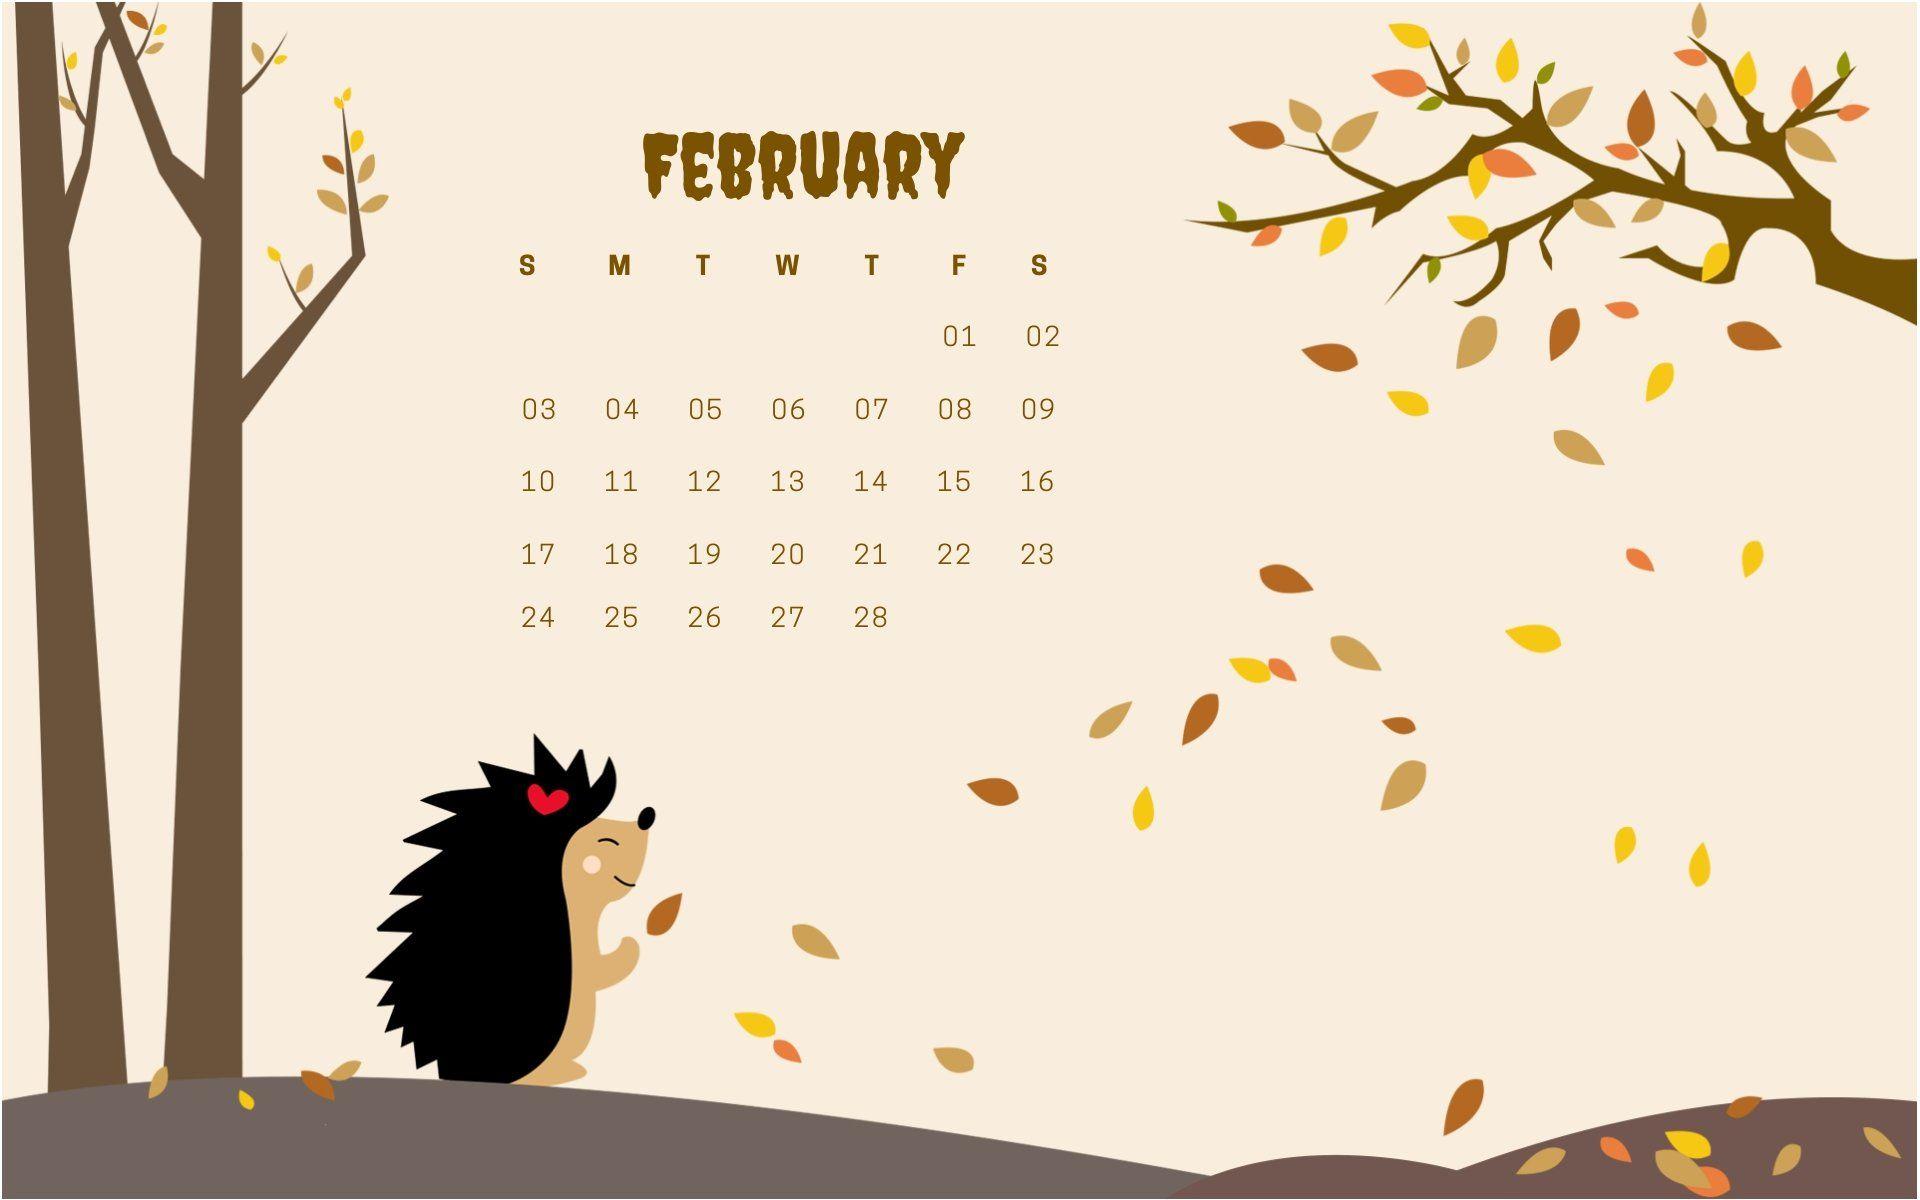 Free February 2019 Calendar Wallpapers Download Calendar